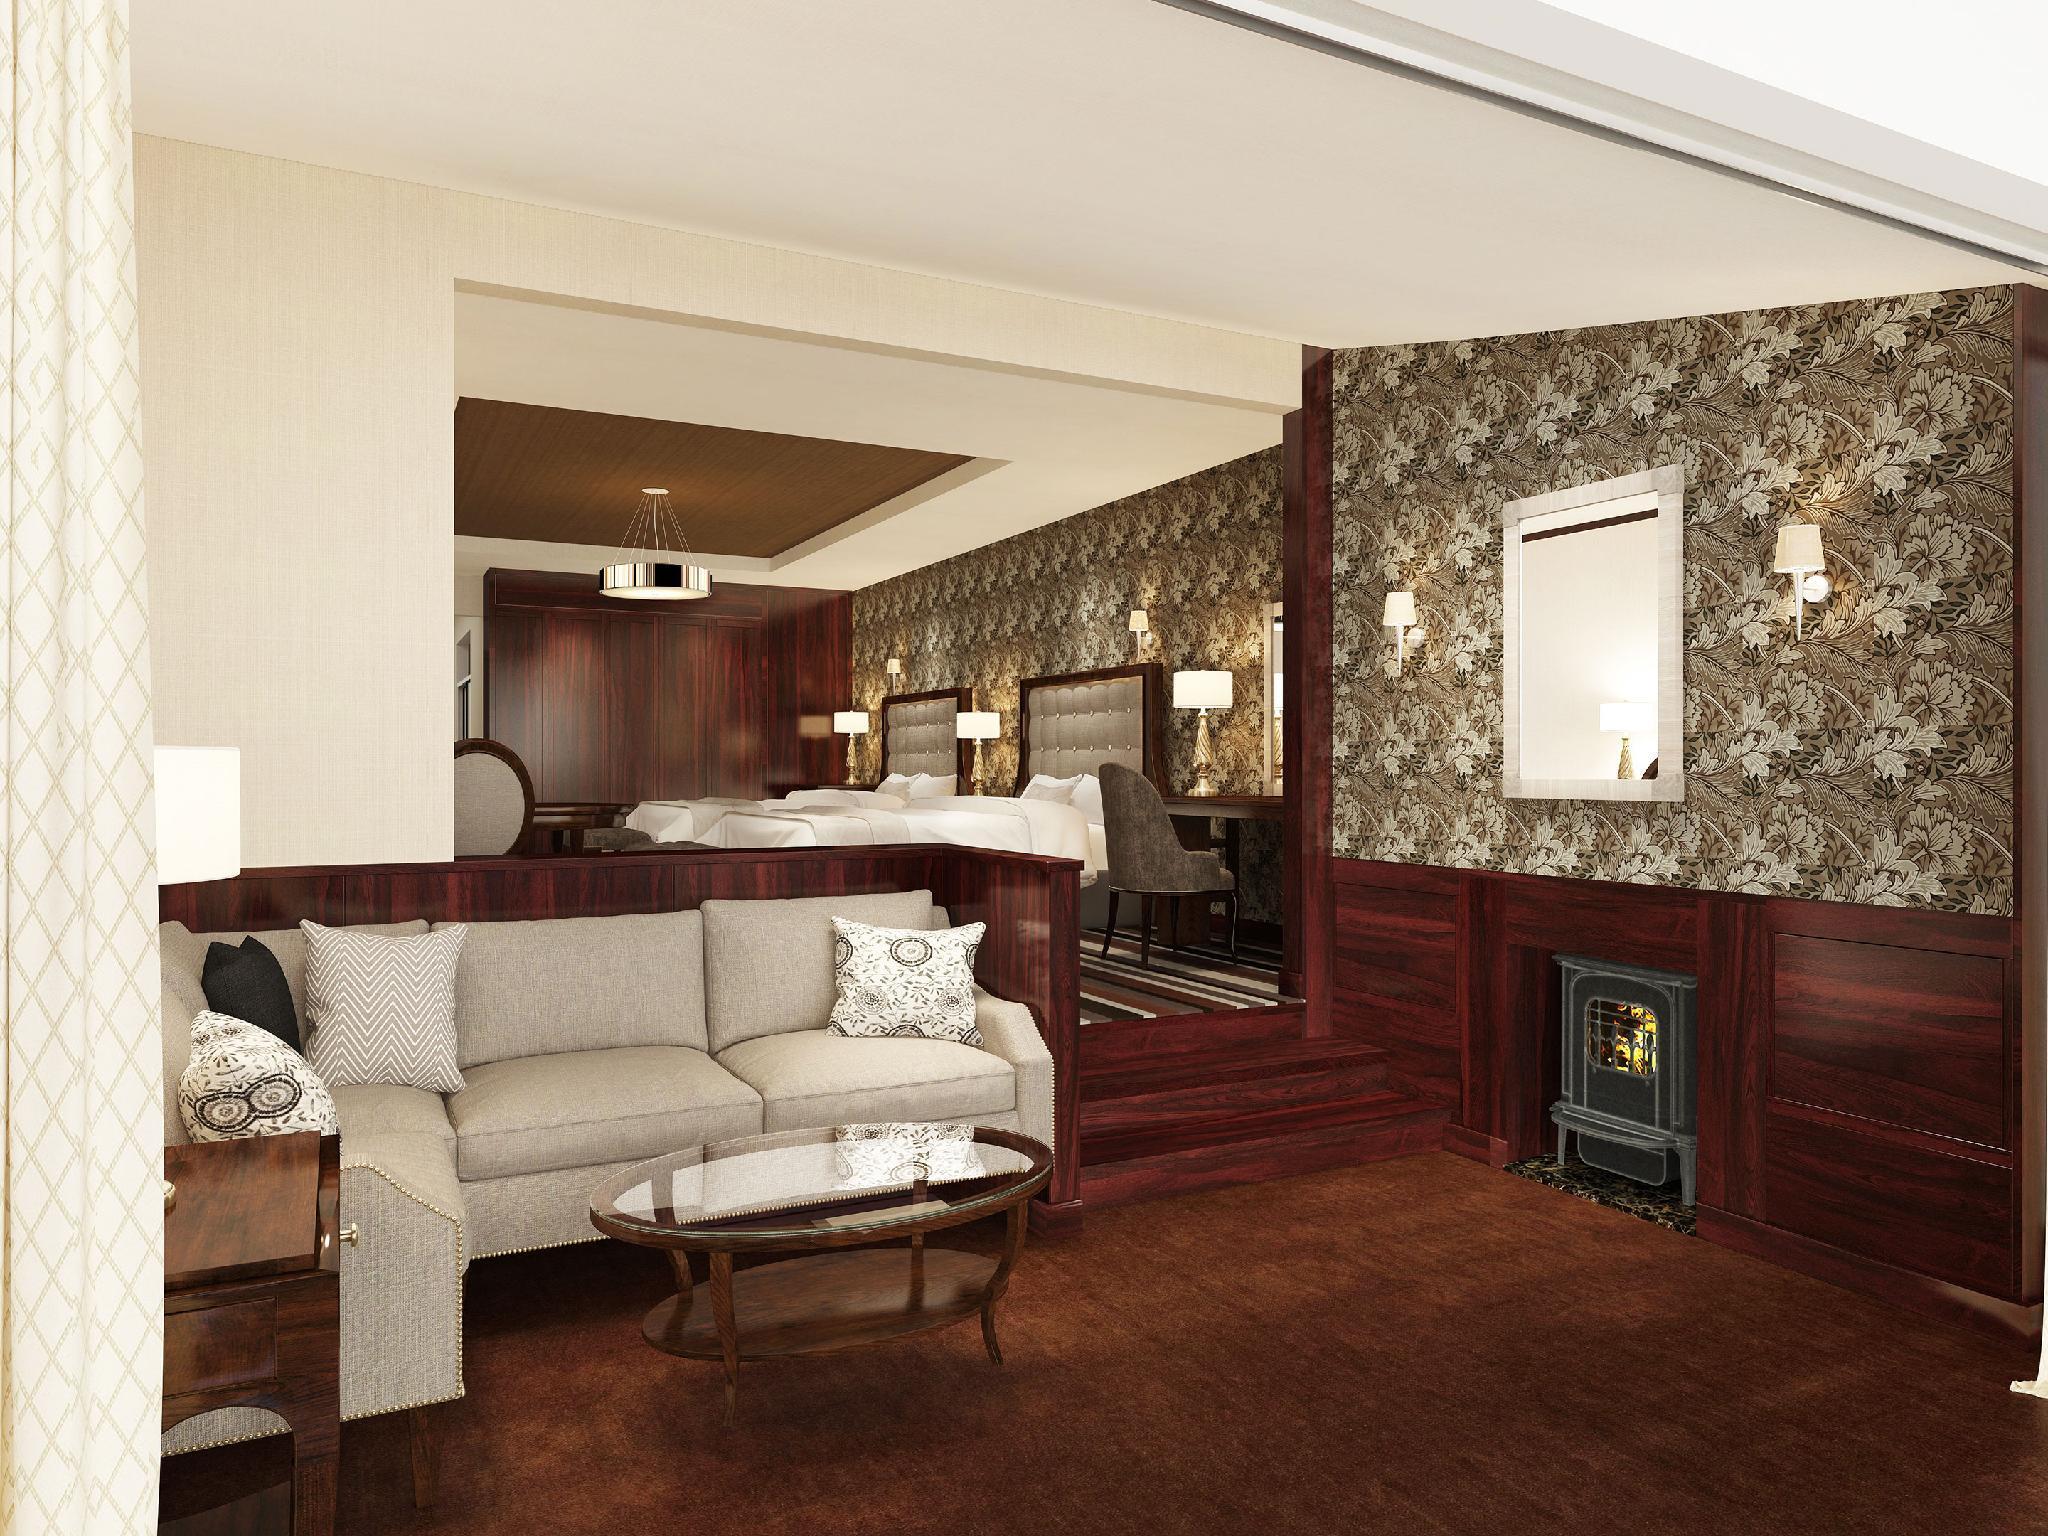 Le Grand Karuizawa Hotel & Resort